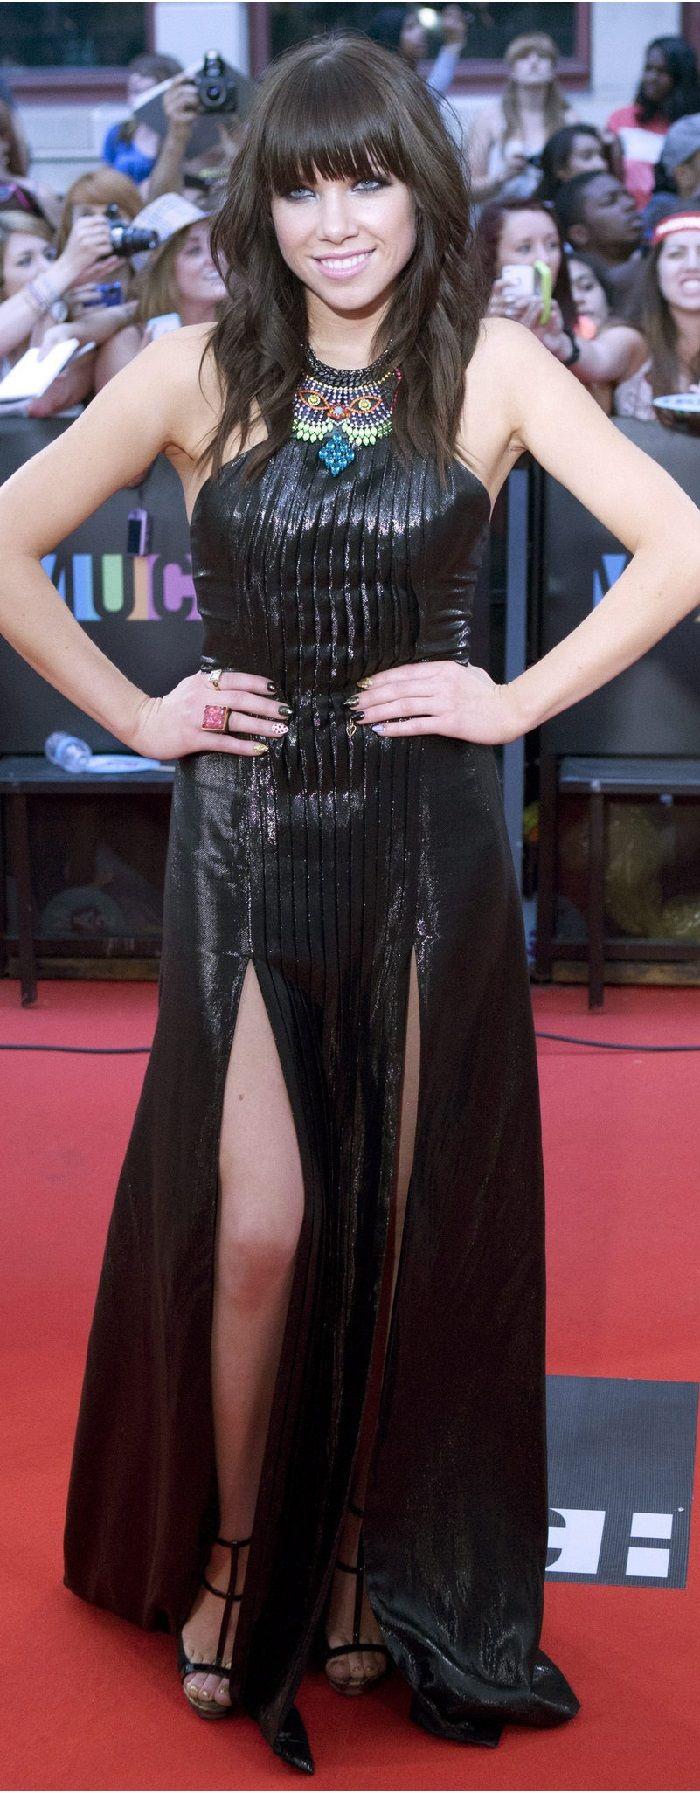 Venus Imposter | Formal dresses long, Dresses, Fashion